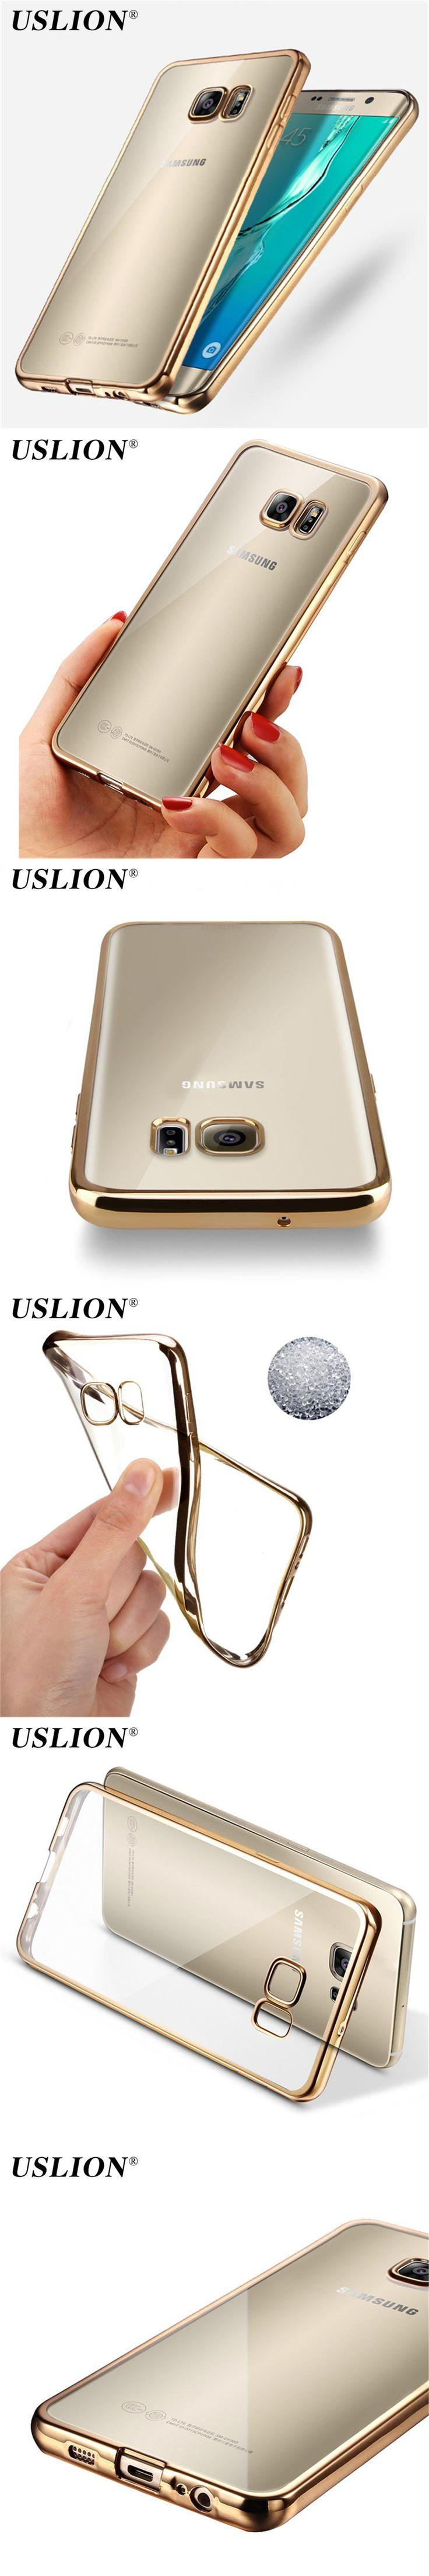 USLION Luxury Electroplated Phone Case For Samsung Galaxy S6 S6 Edge S7 S7 Edge S8 S8 Plus Note 3 4 5 J A Clear Soft TPU Case